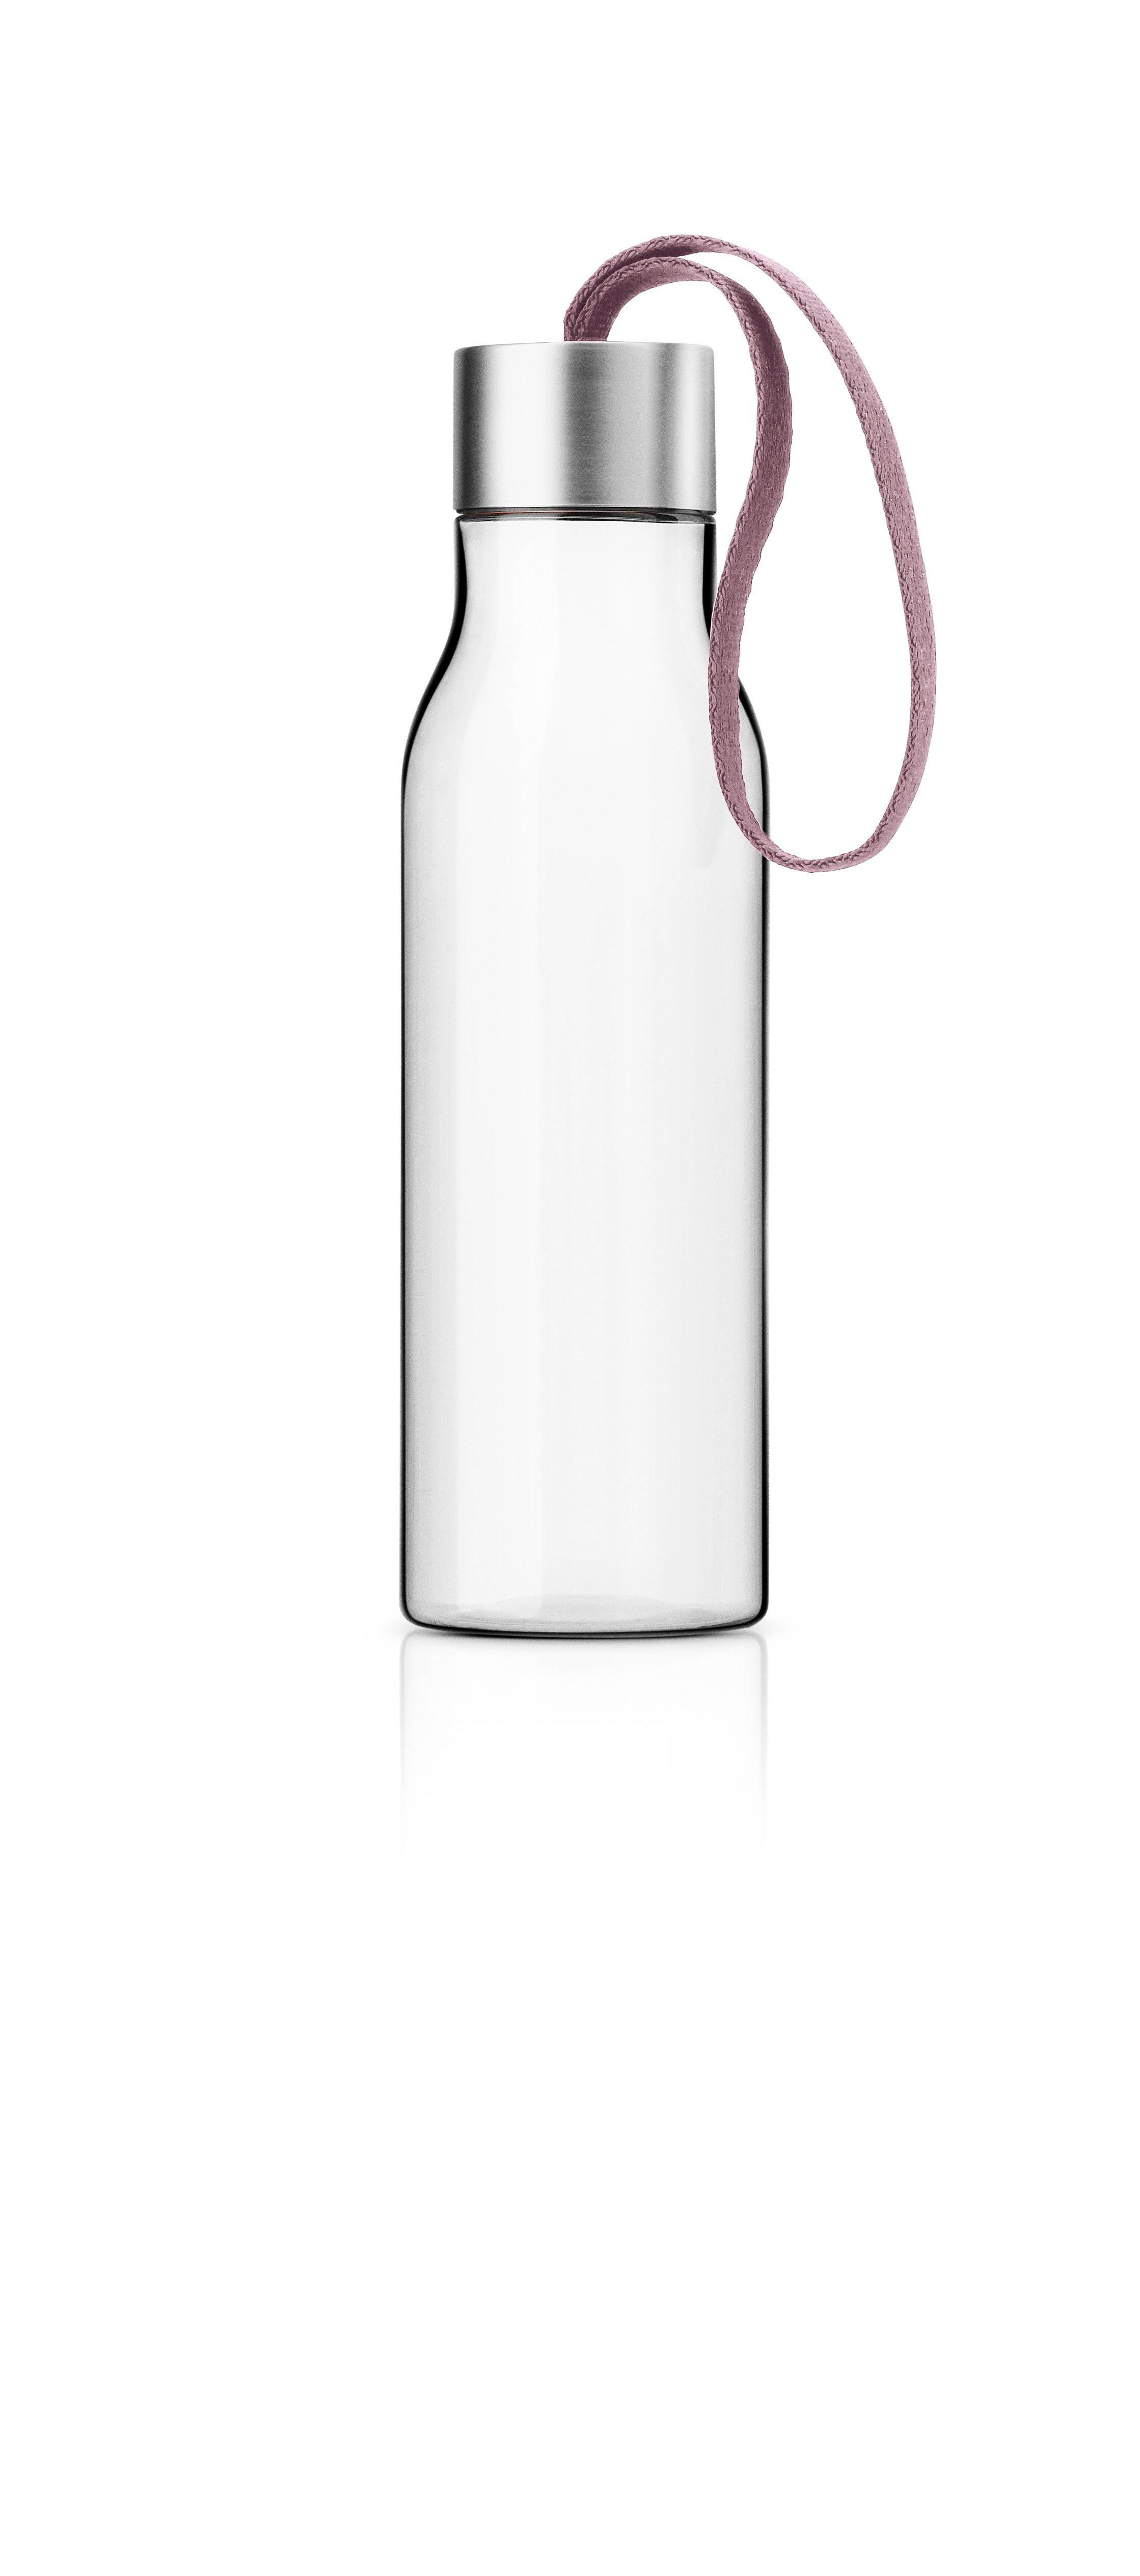 Eva Solo - Drinking Bottle 0,5 L - Nordic Rose (503024)